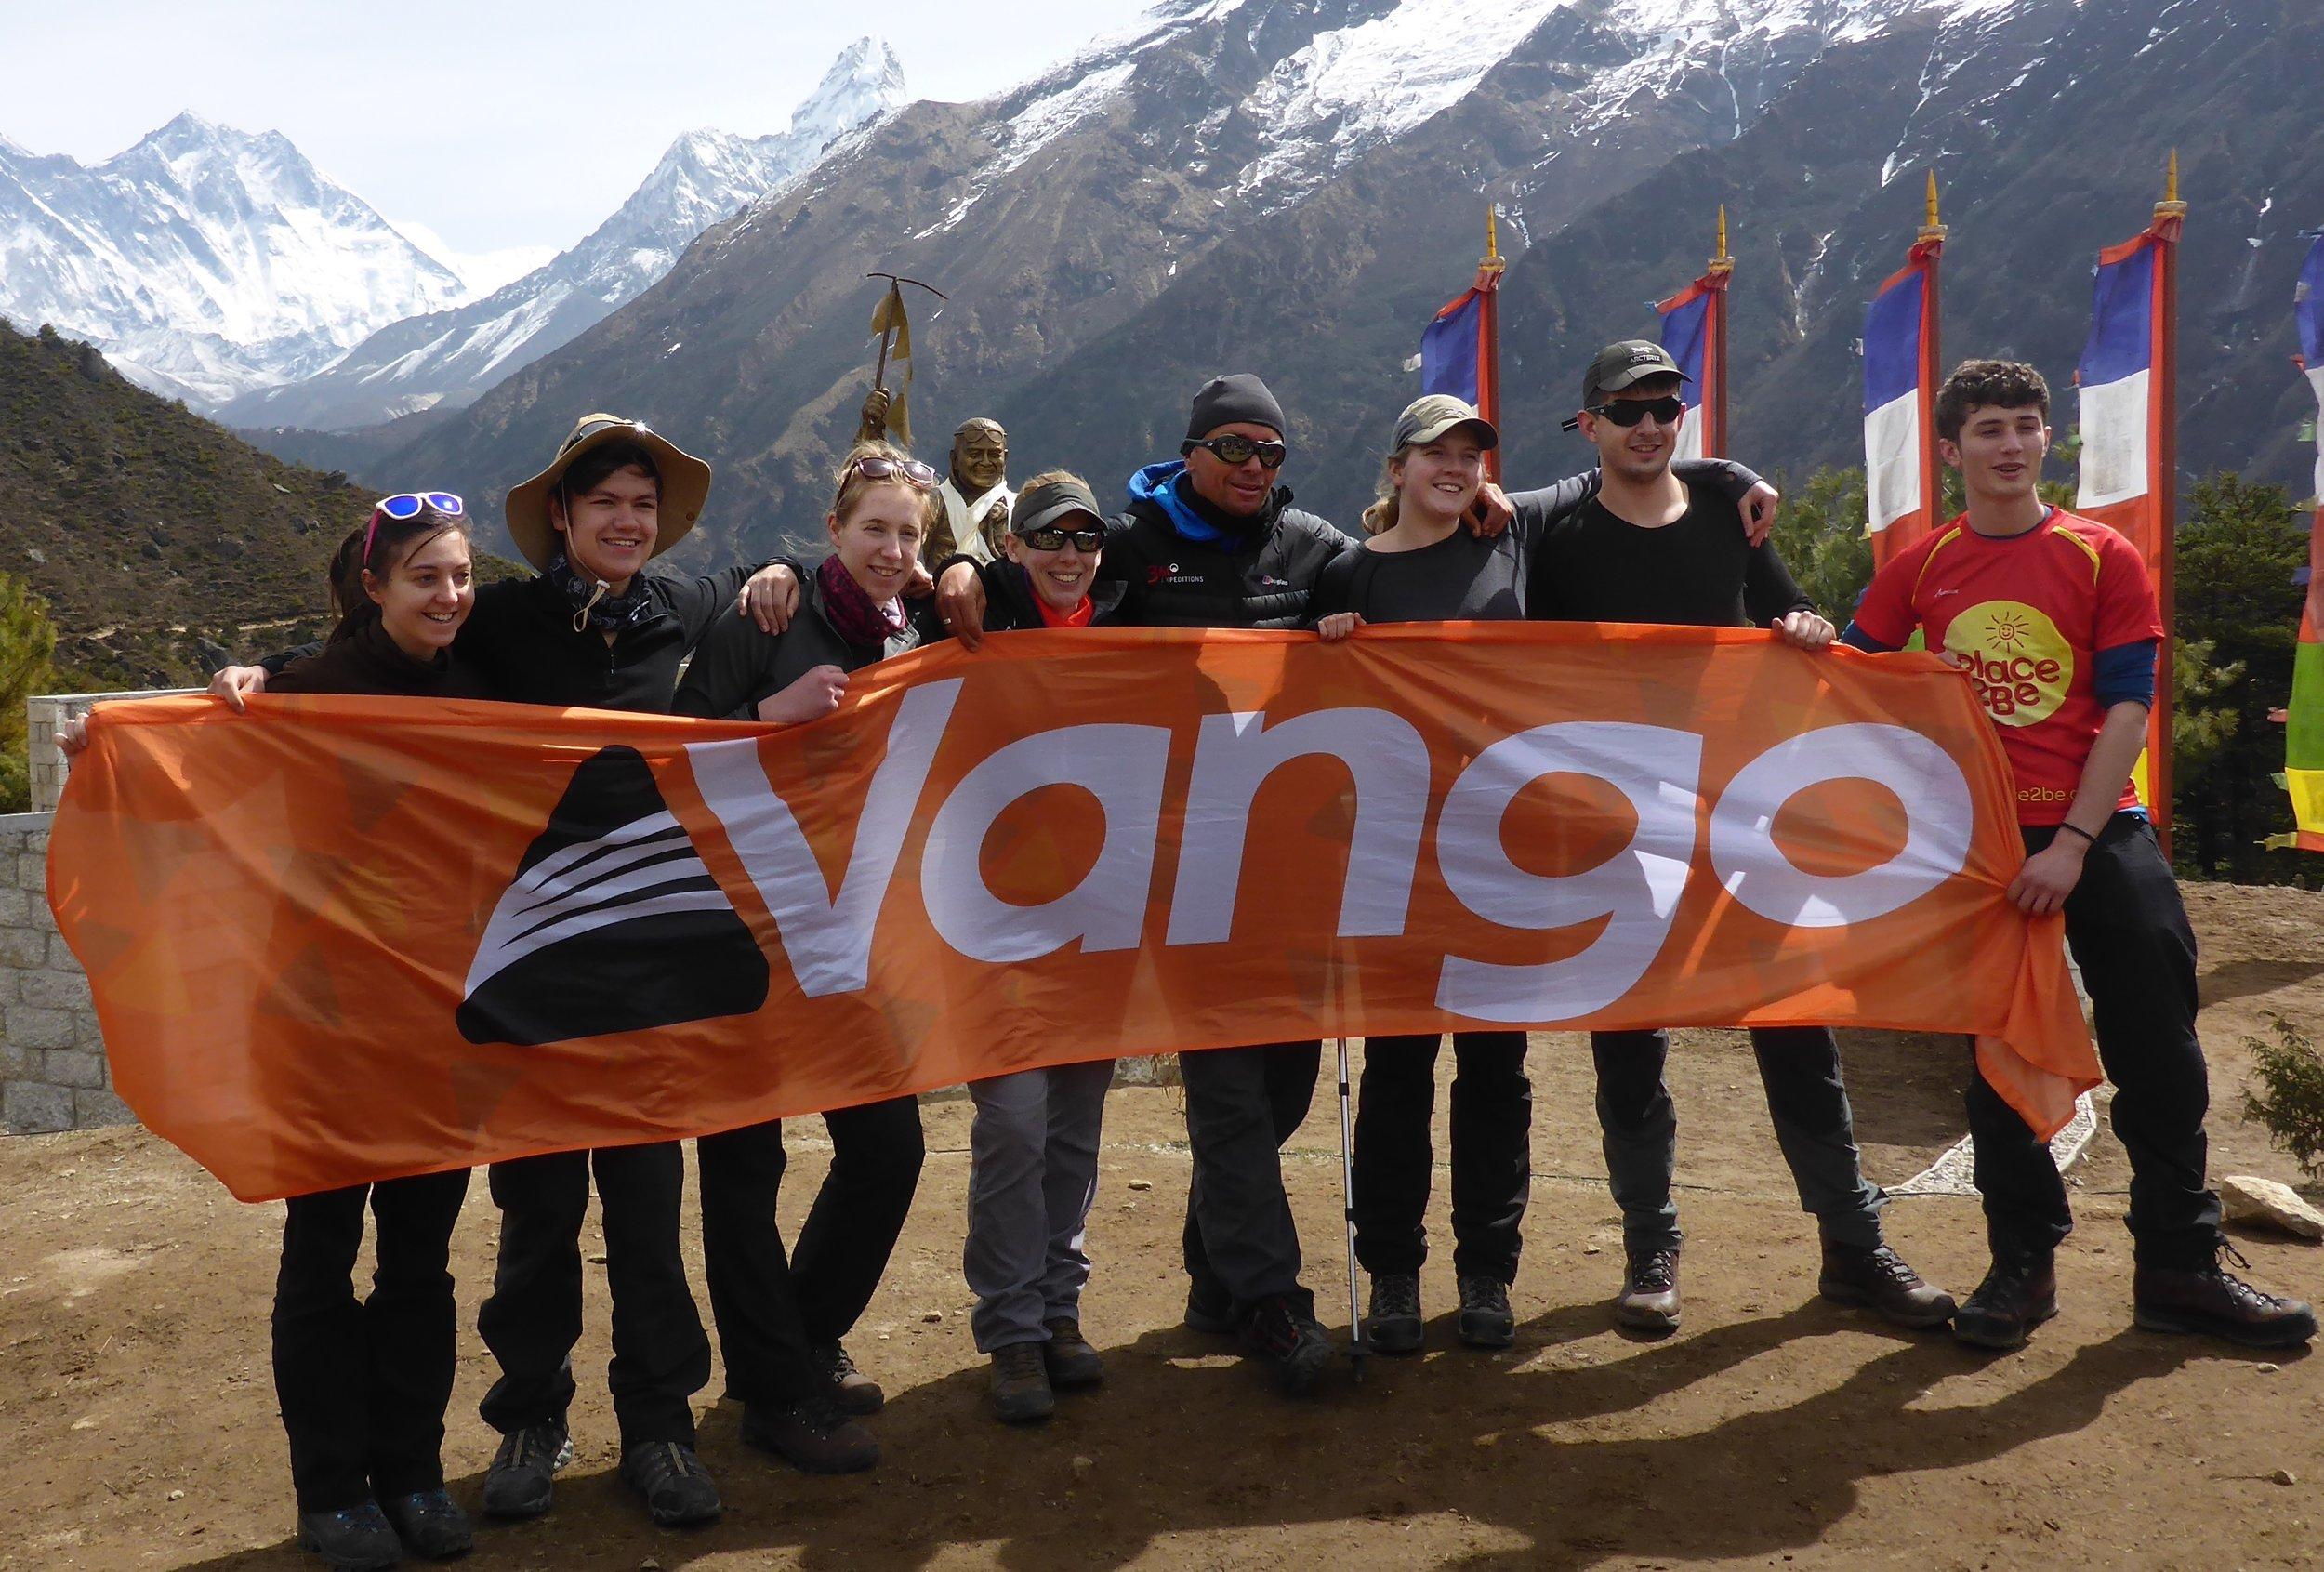 My fabulous DofE Gold team at the Tenzing Norgay memorial, above Namche Bazaar, Nepal. April 2015